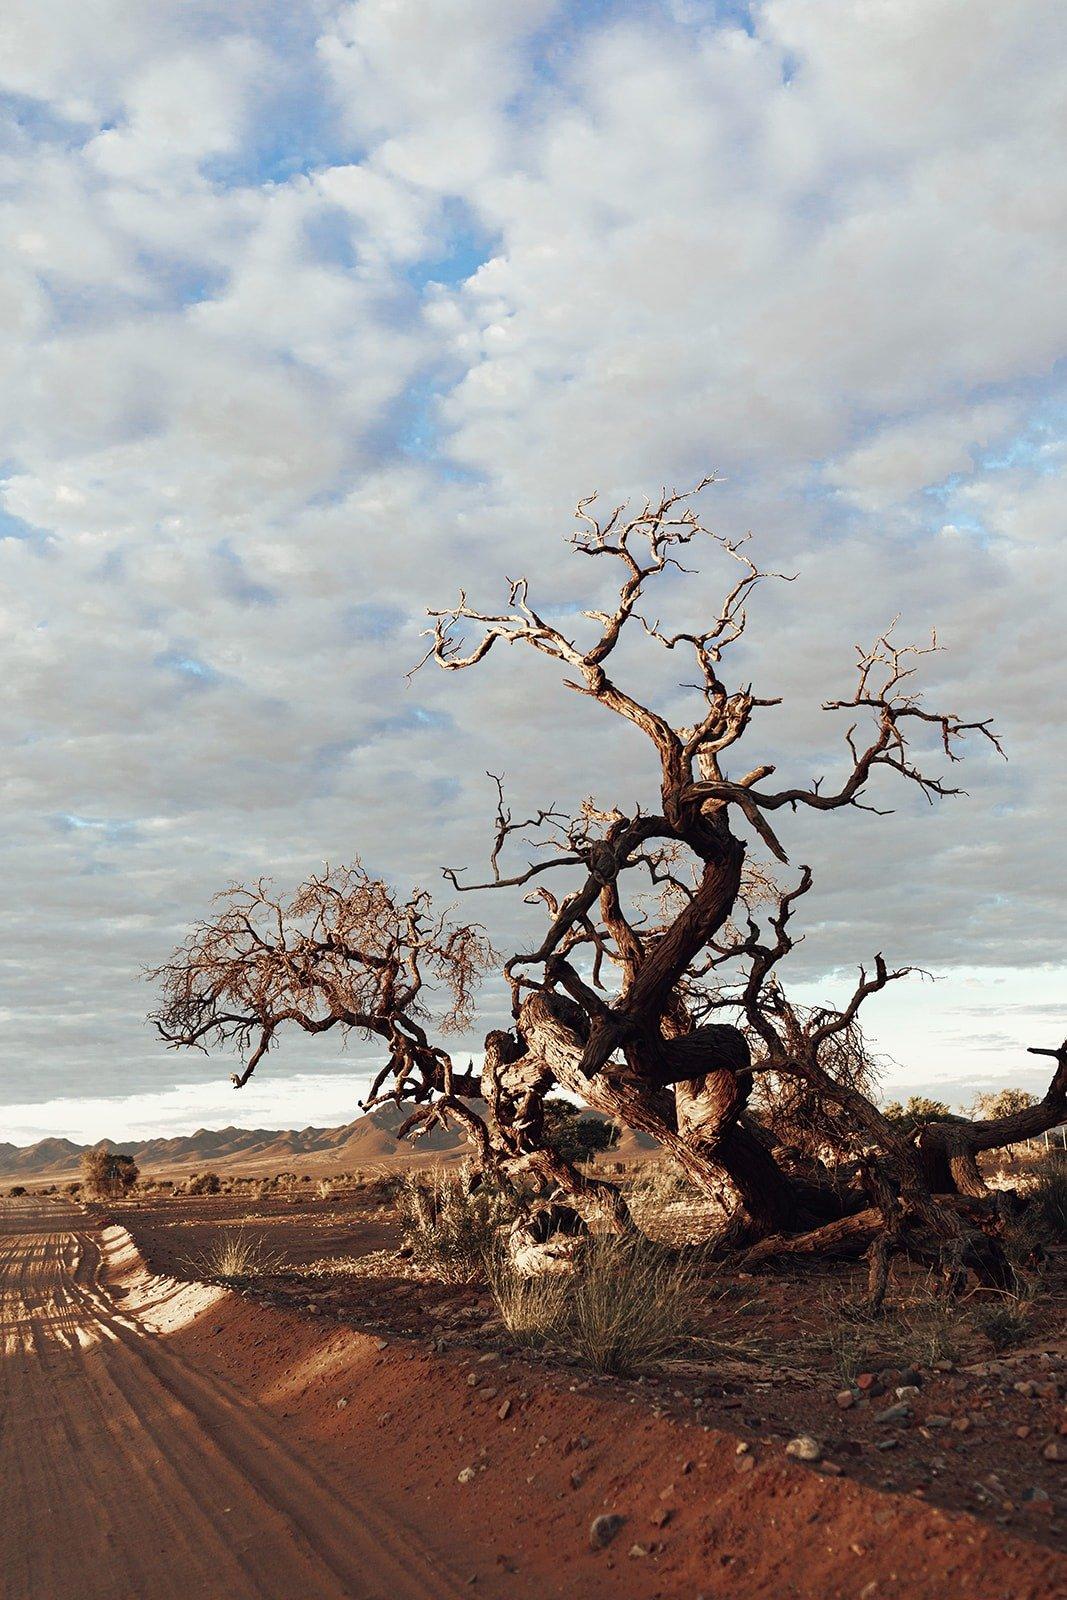 capturing Namibia's authenticity